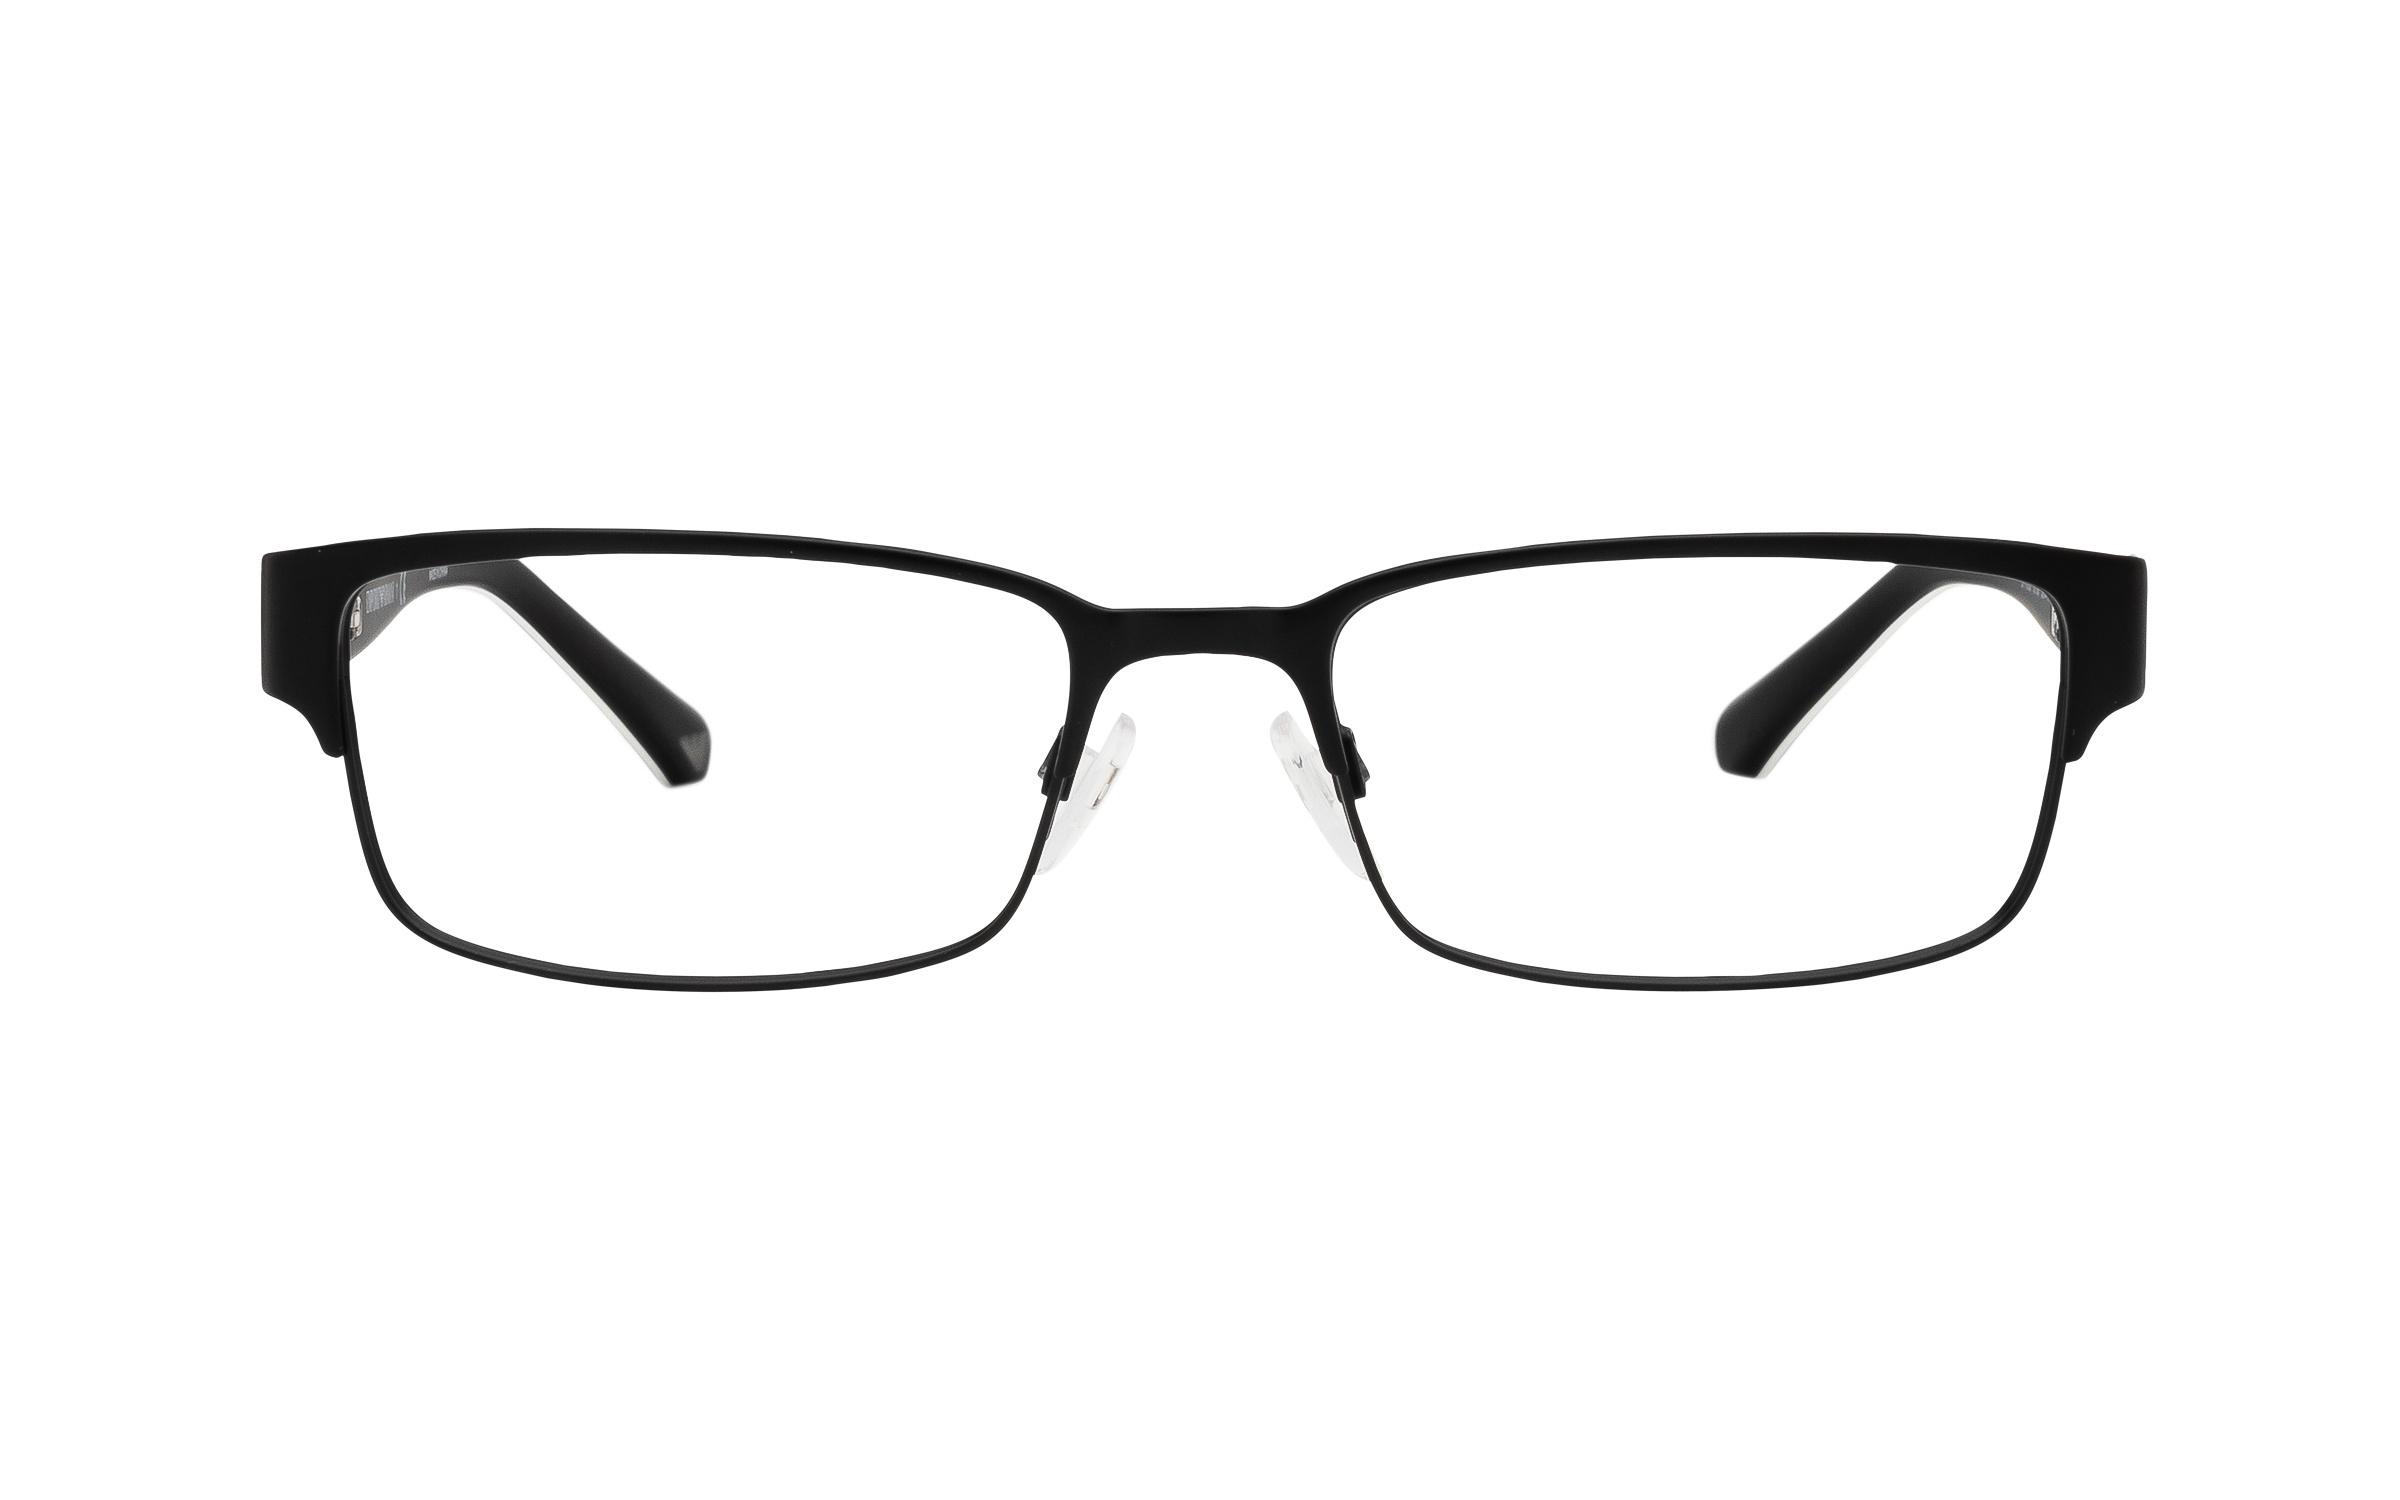 coastal.com - Emporio Armani EA1036 3109 (53) Eyeglasses and Frame in Matte Black – Online Coastal 188.00 USD